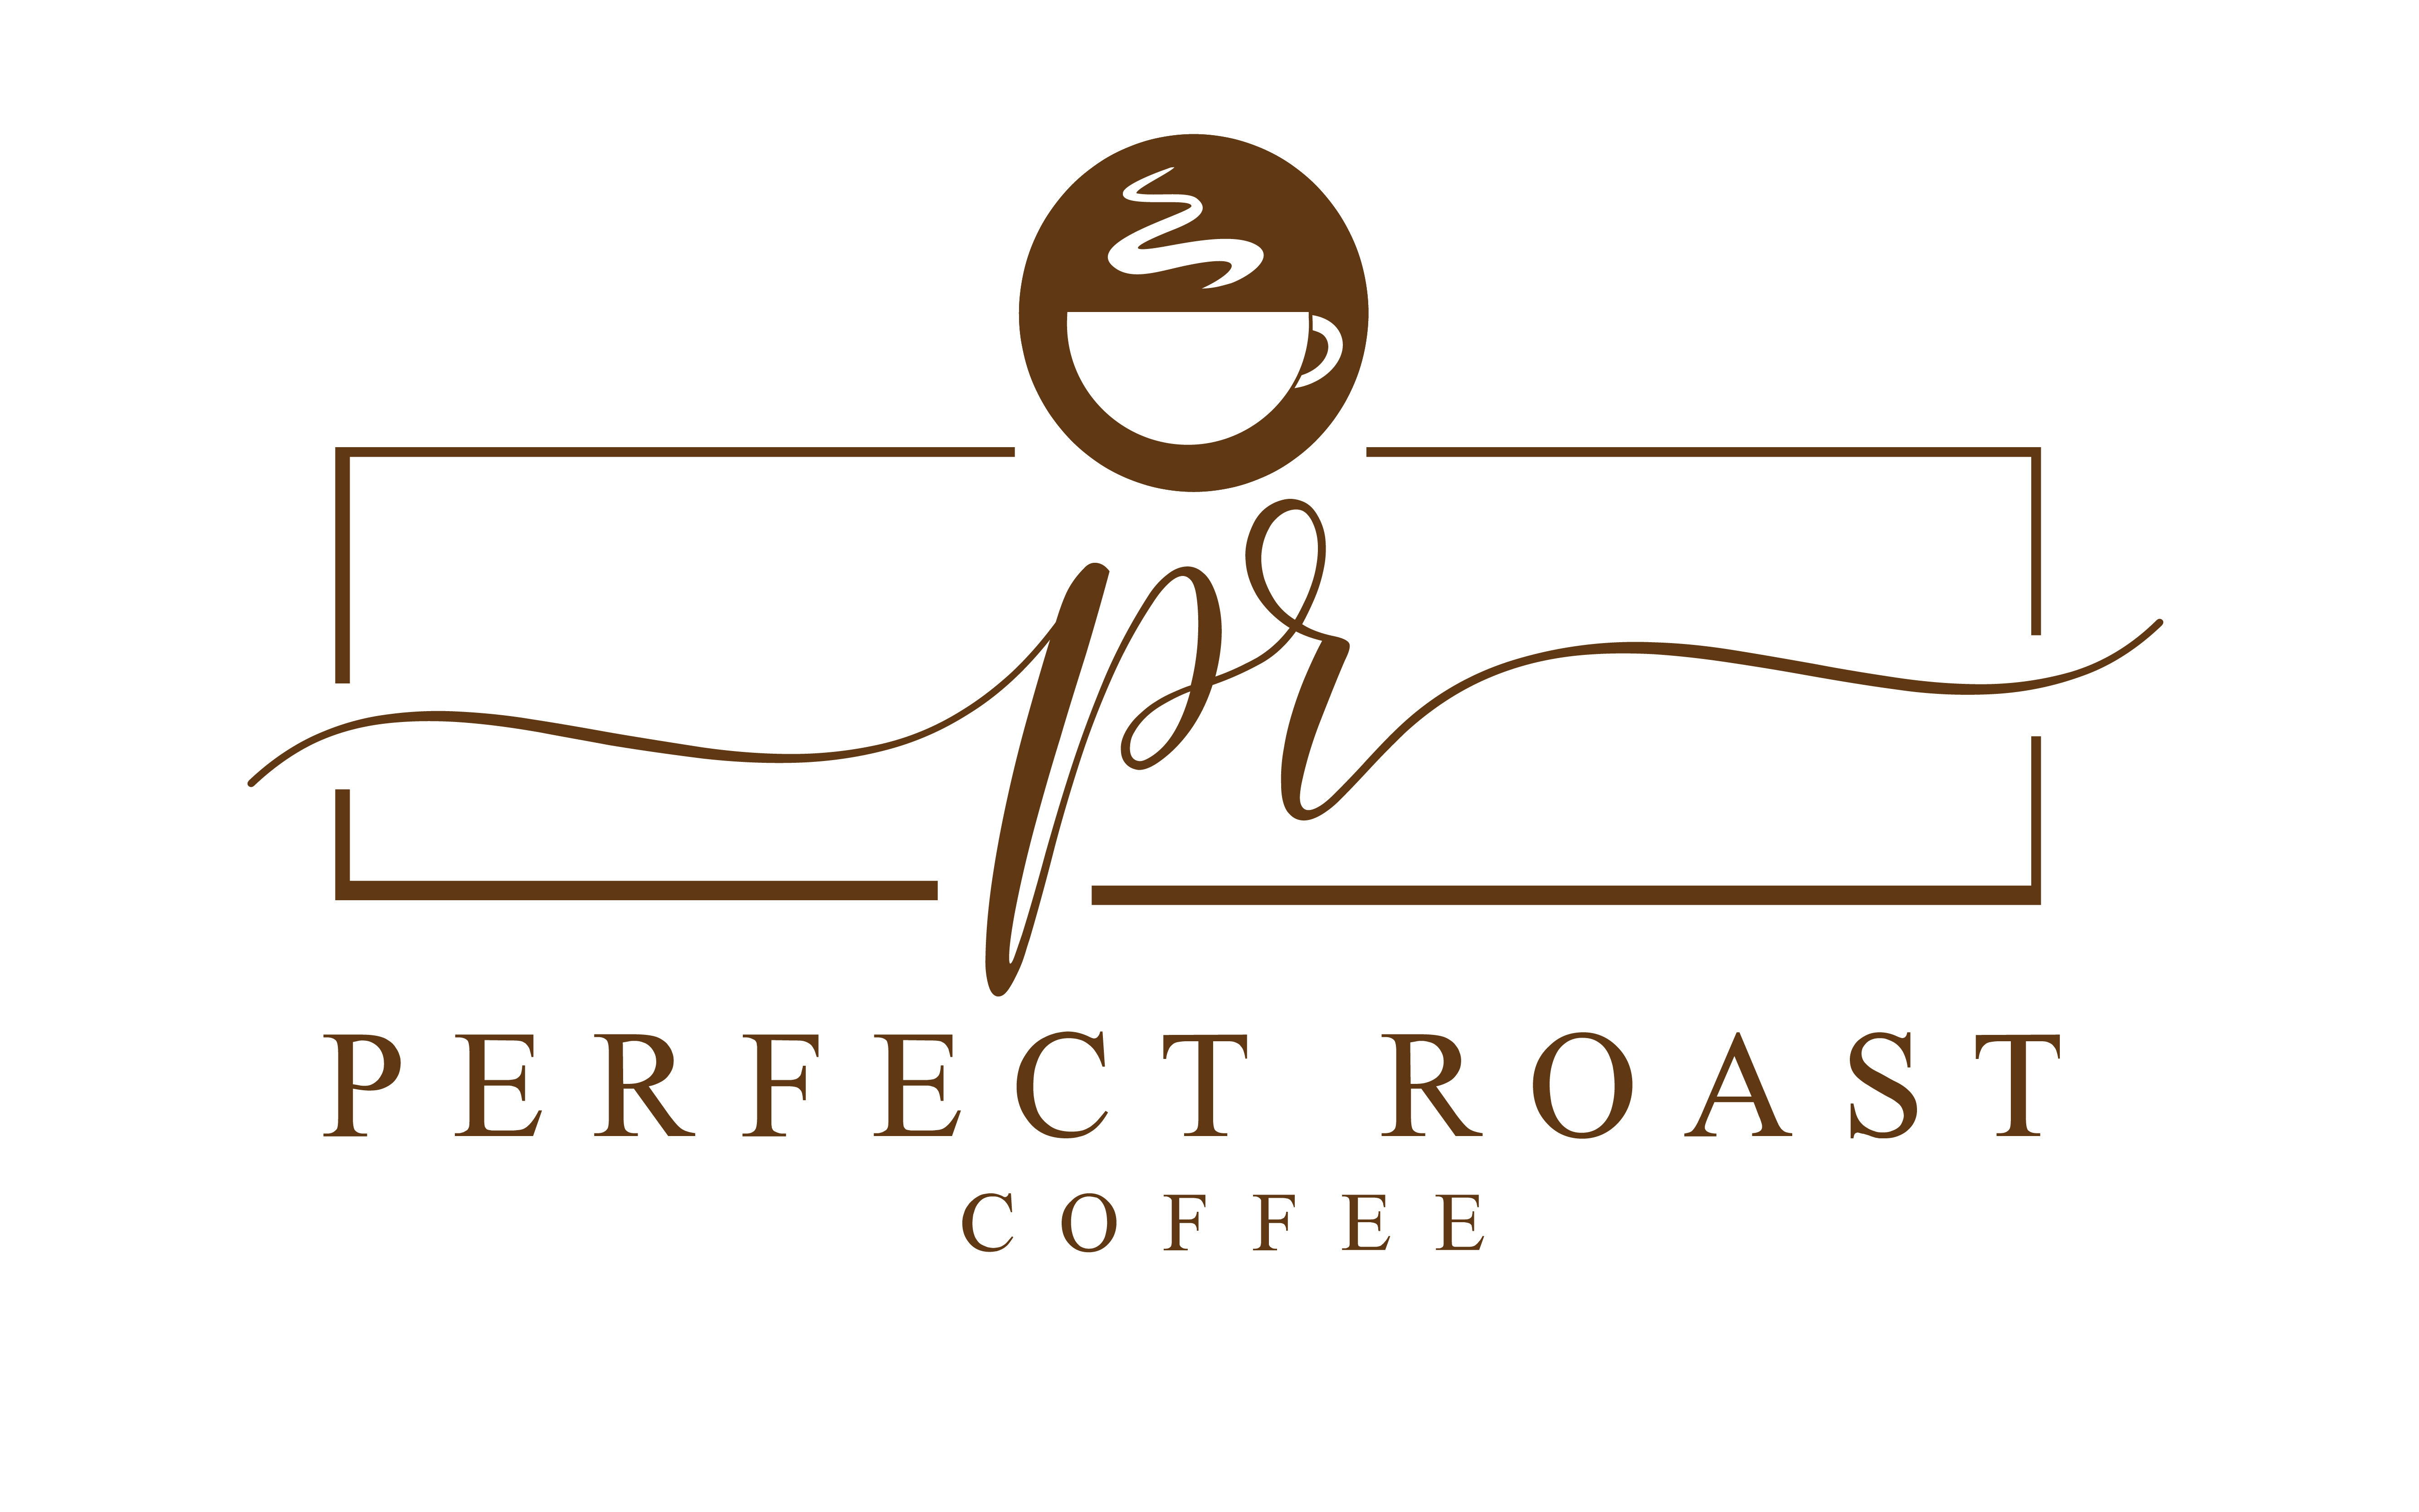 Perfect Roast Coffee LLC